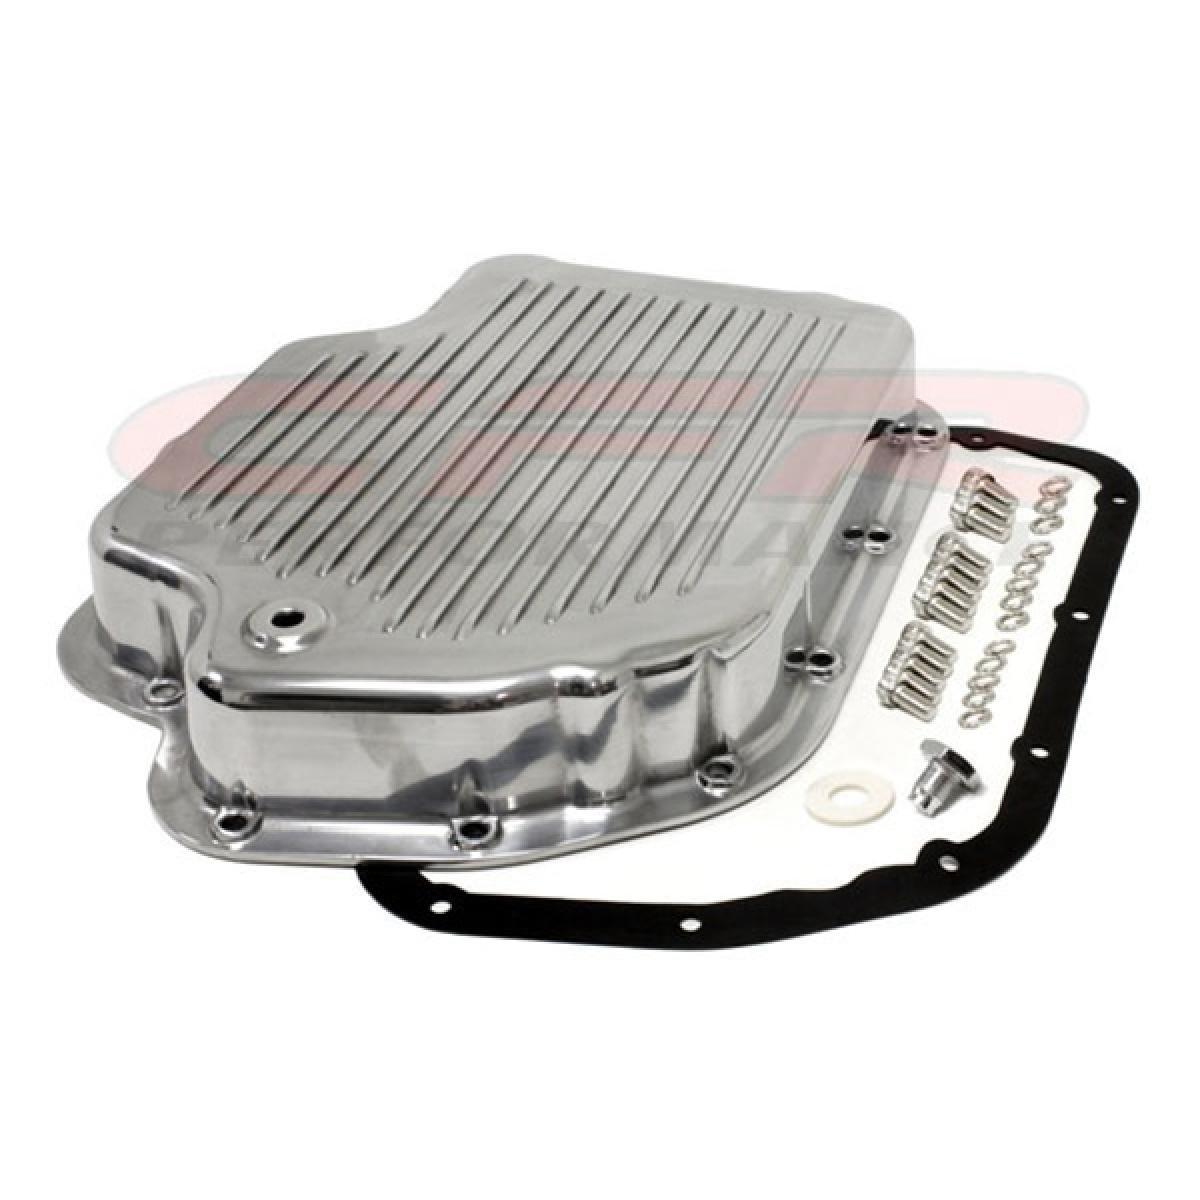 Chevy//GM Turbo TH-400 Aluminum Transmission Pan Kit Polished